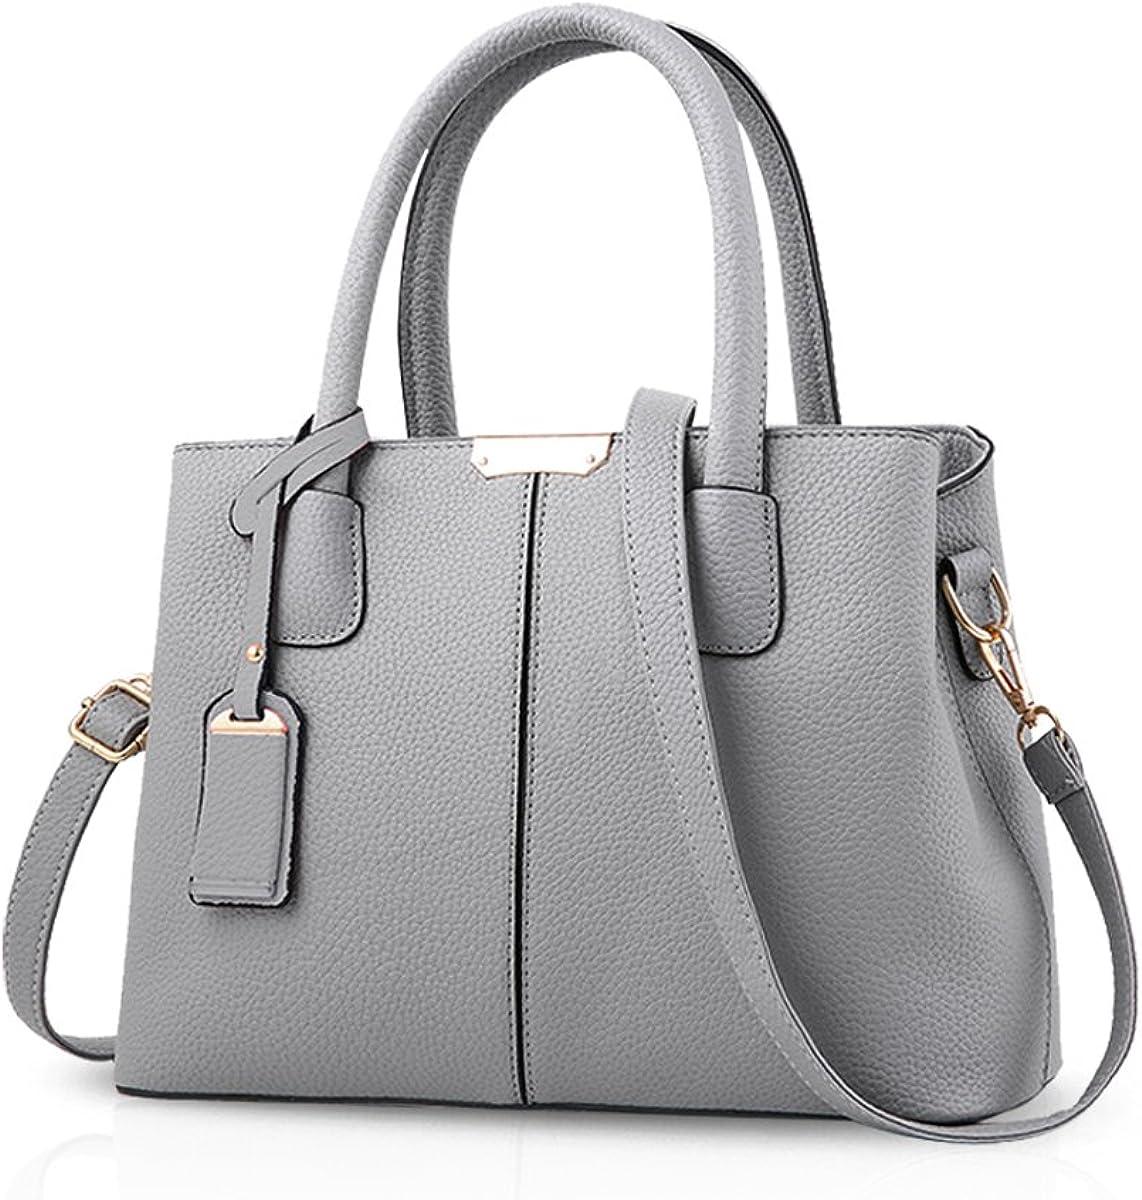 NICOLEDORIS Women Lady Handbags Shoulder Crossbody Bag Tote National Sale special price uniform free shipping